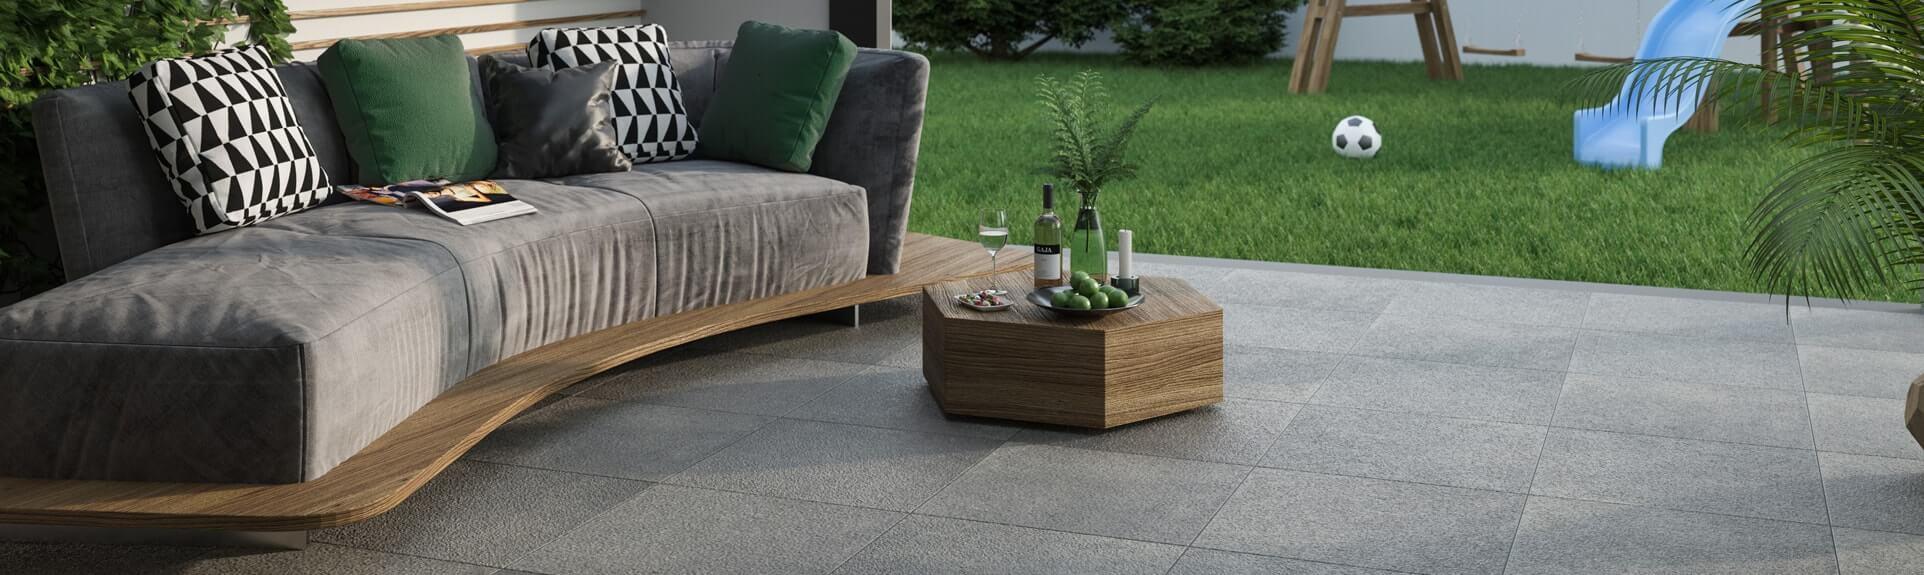 Terrace - Salon, Przedpokój